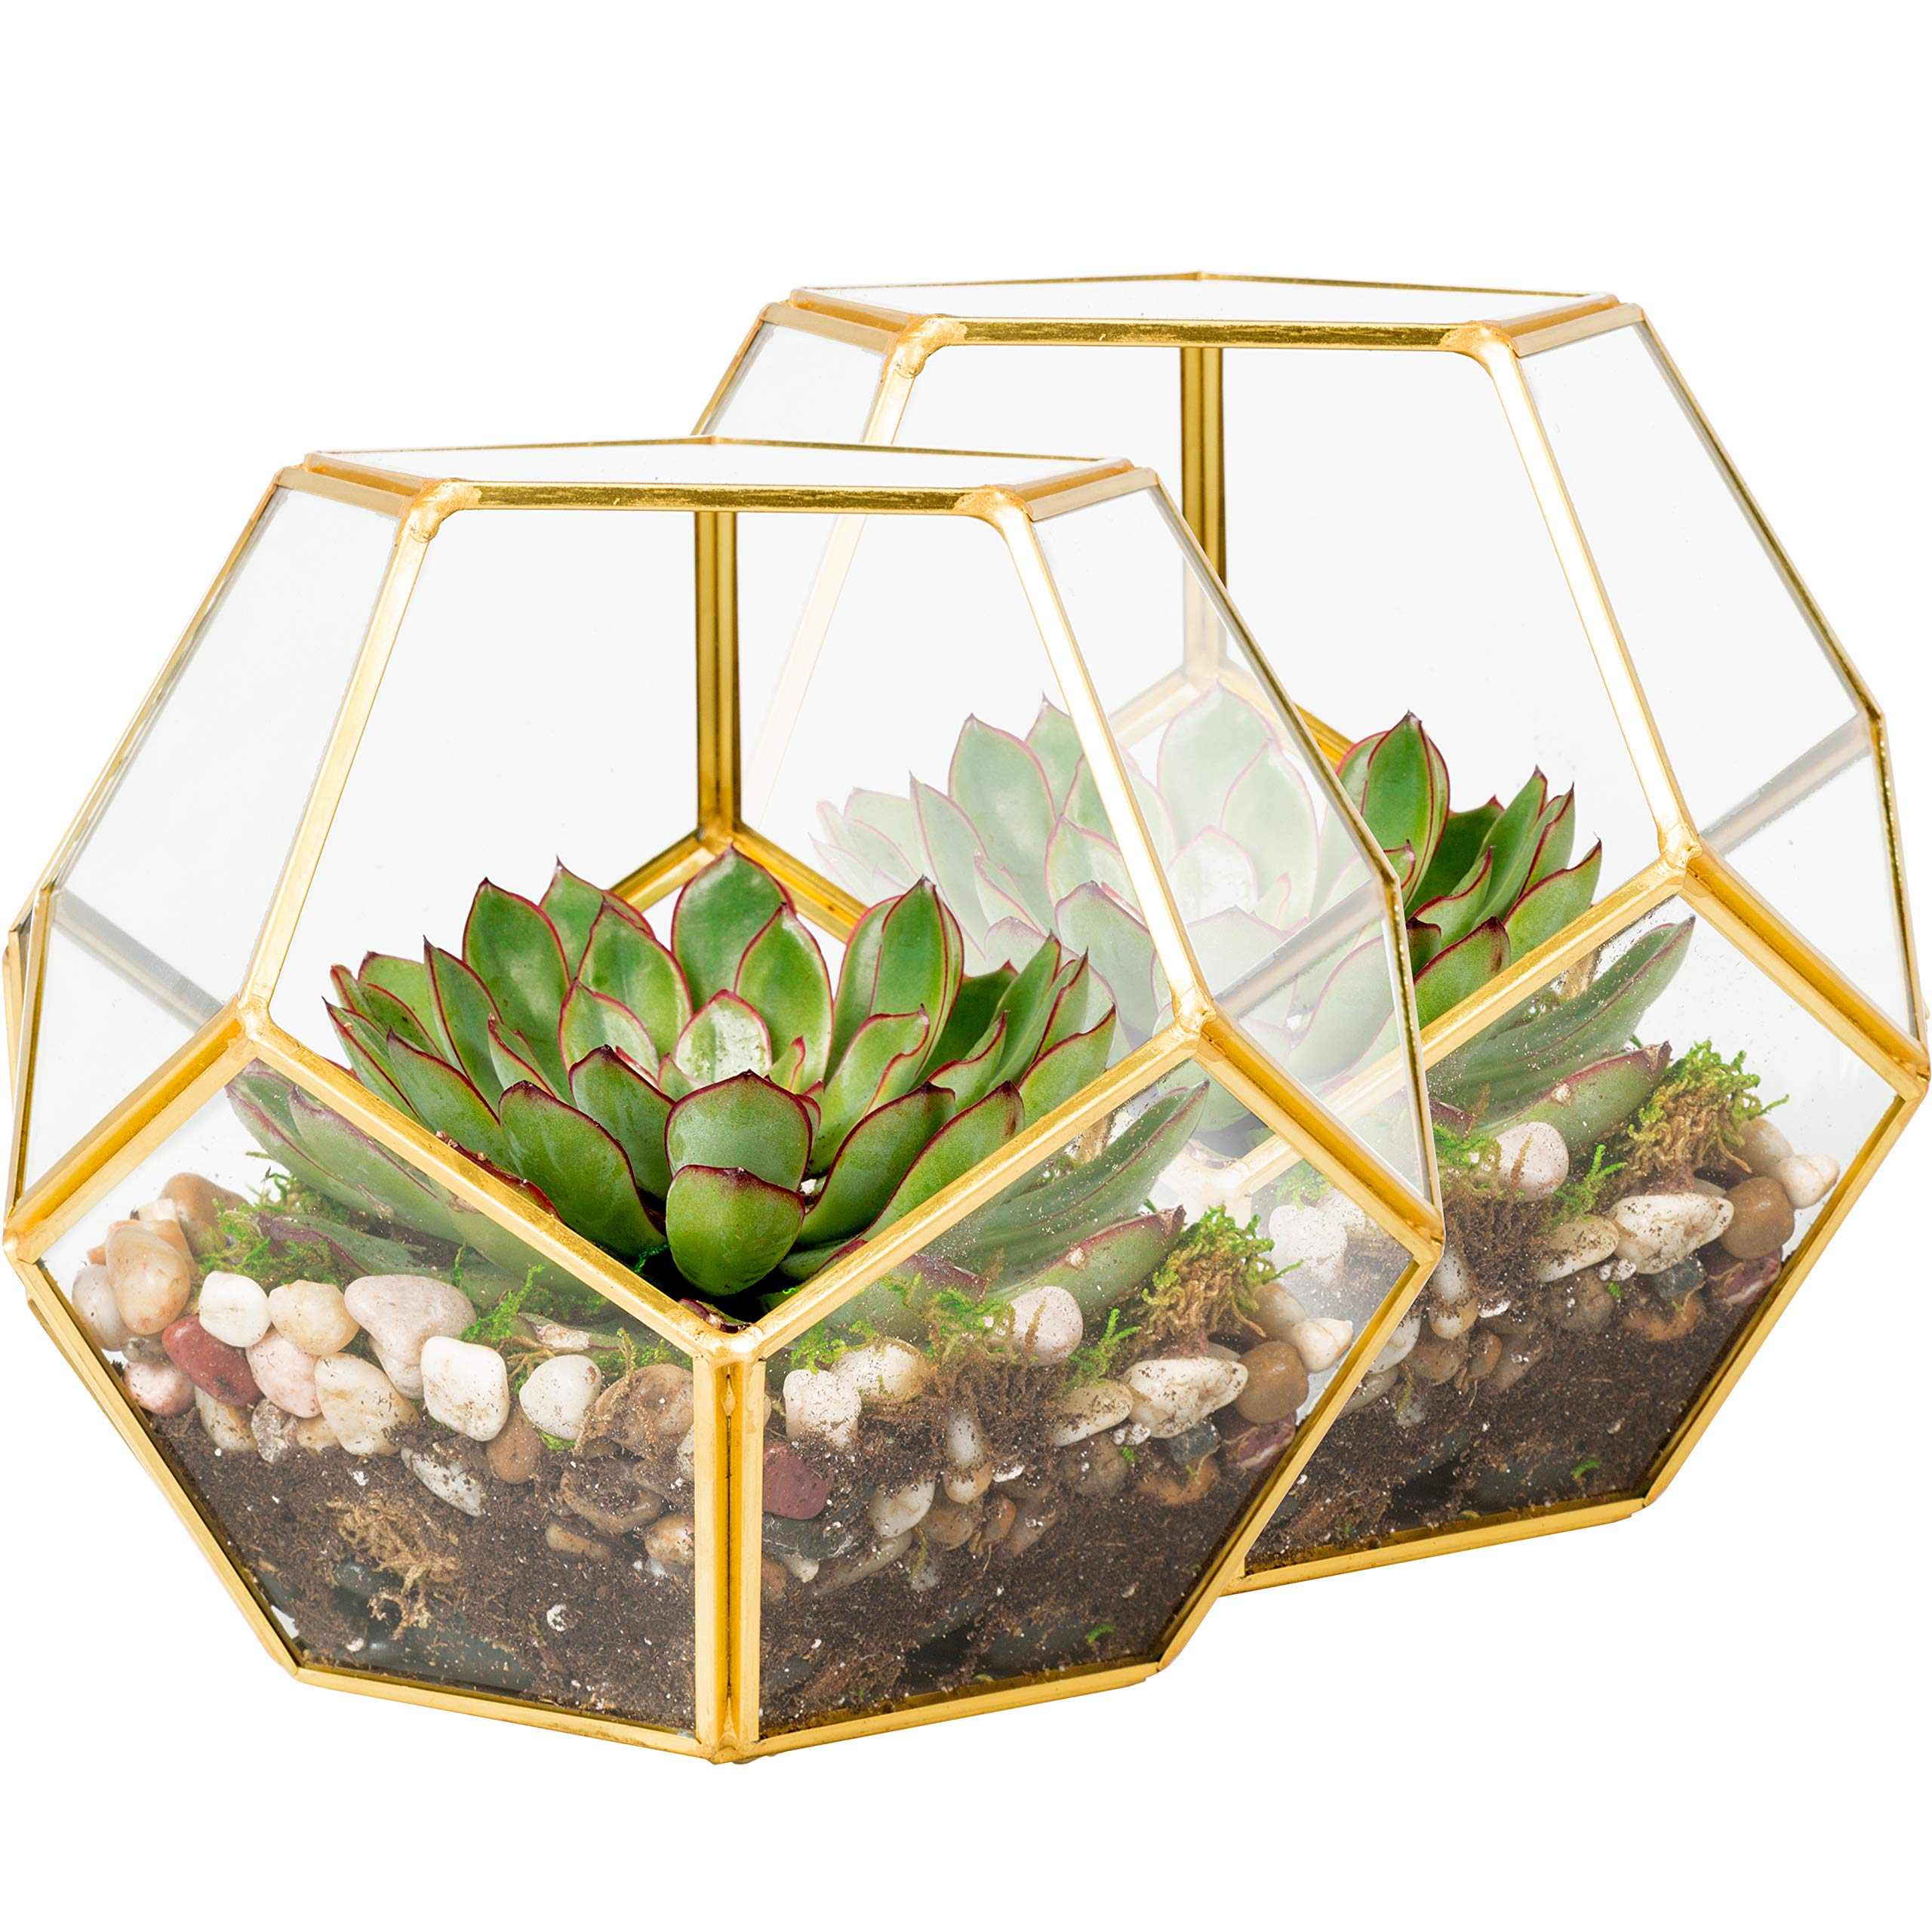 Deco 2 Glass Geometric Terrarium, Succulent & Air Plant Sphere with Gold Trim - 8.2 x 8.2 x 8.2 in (2 Pack) by Deco